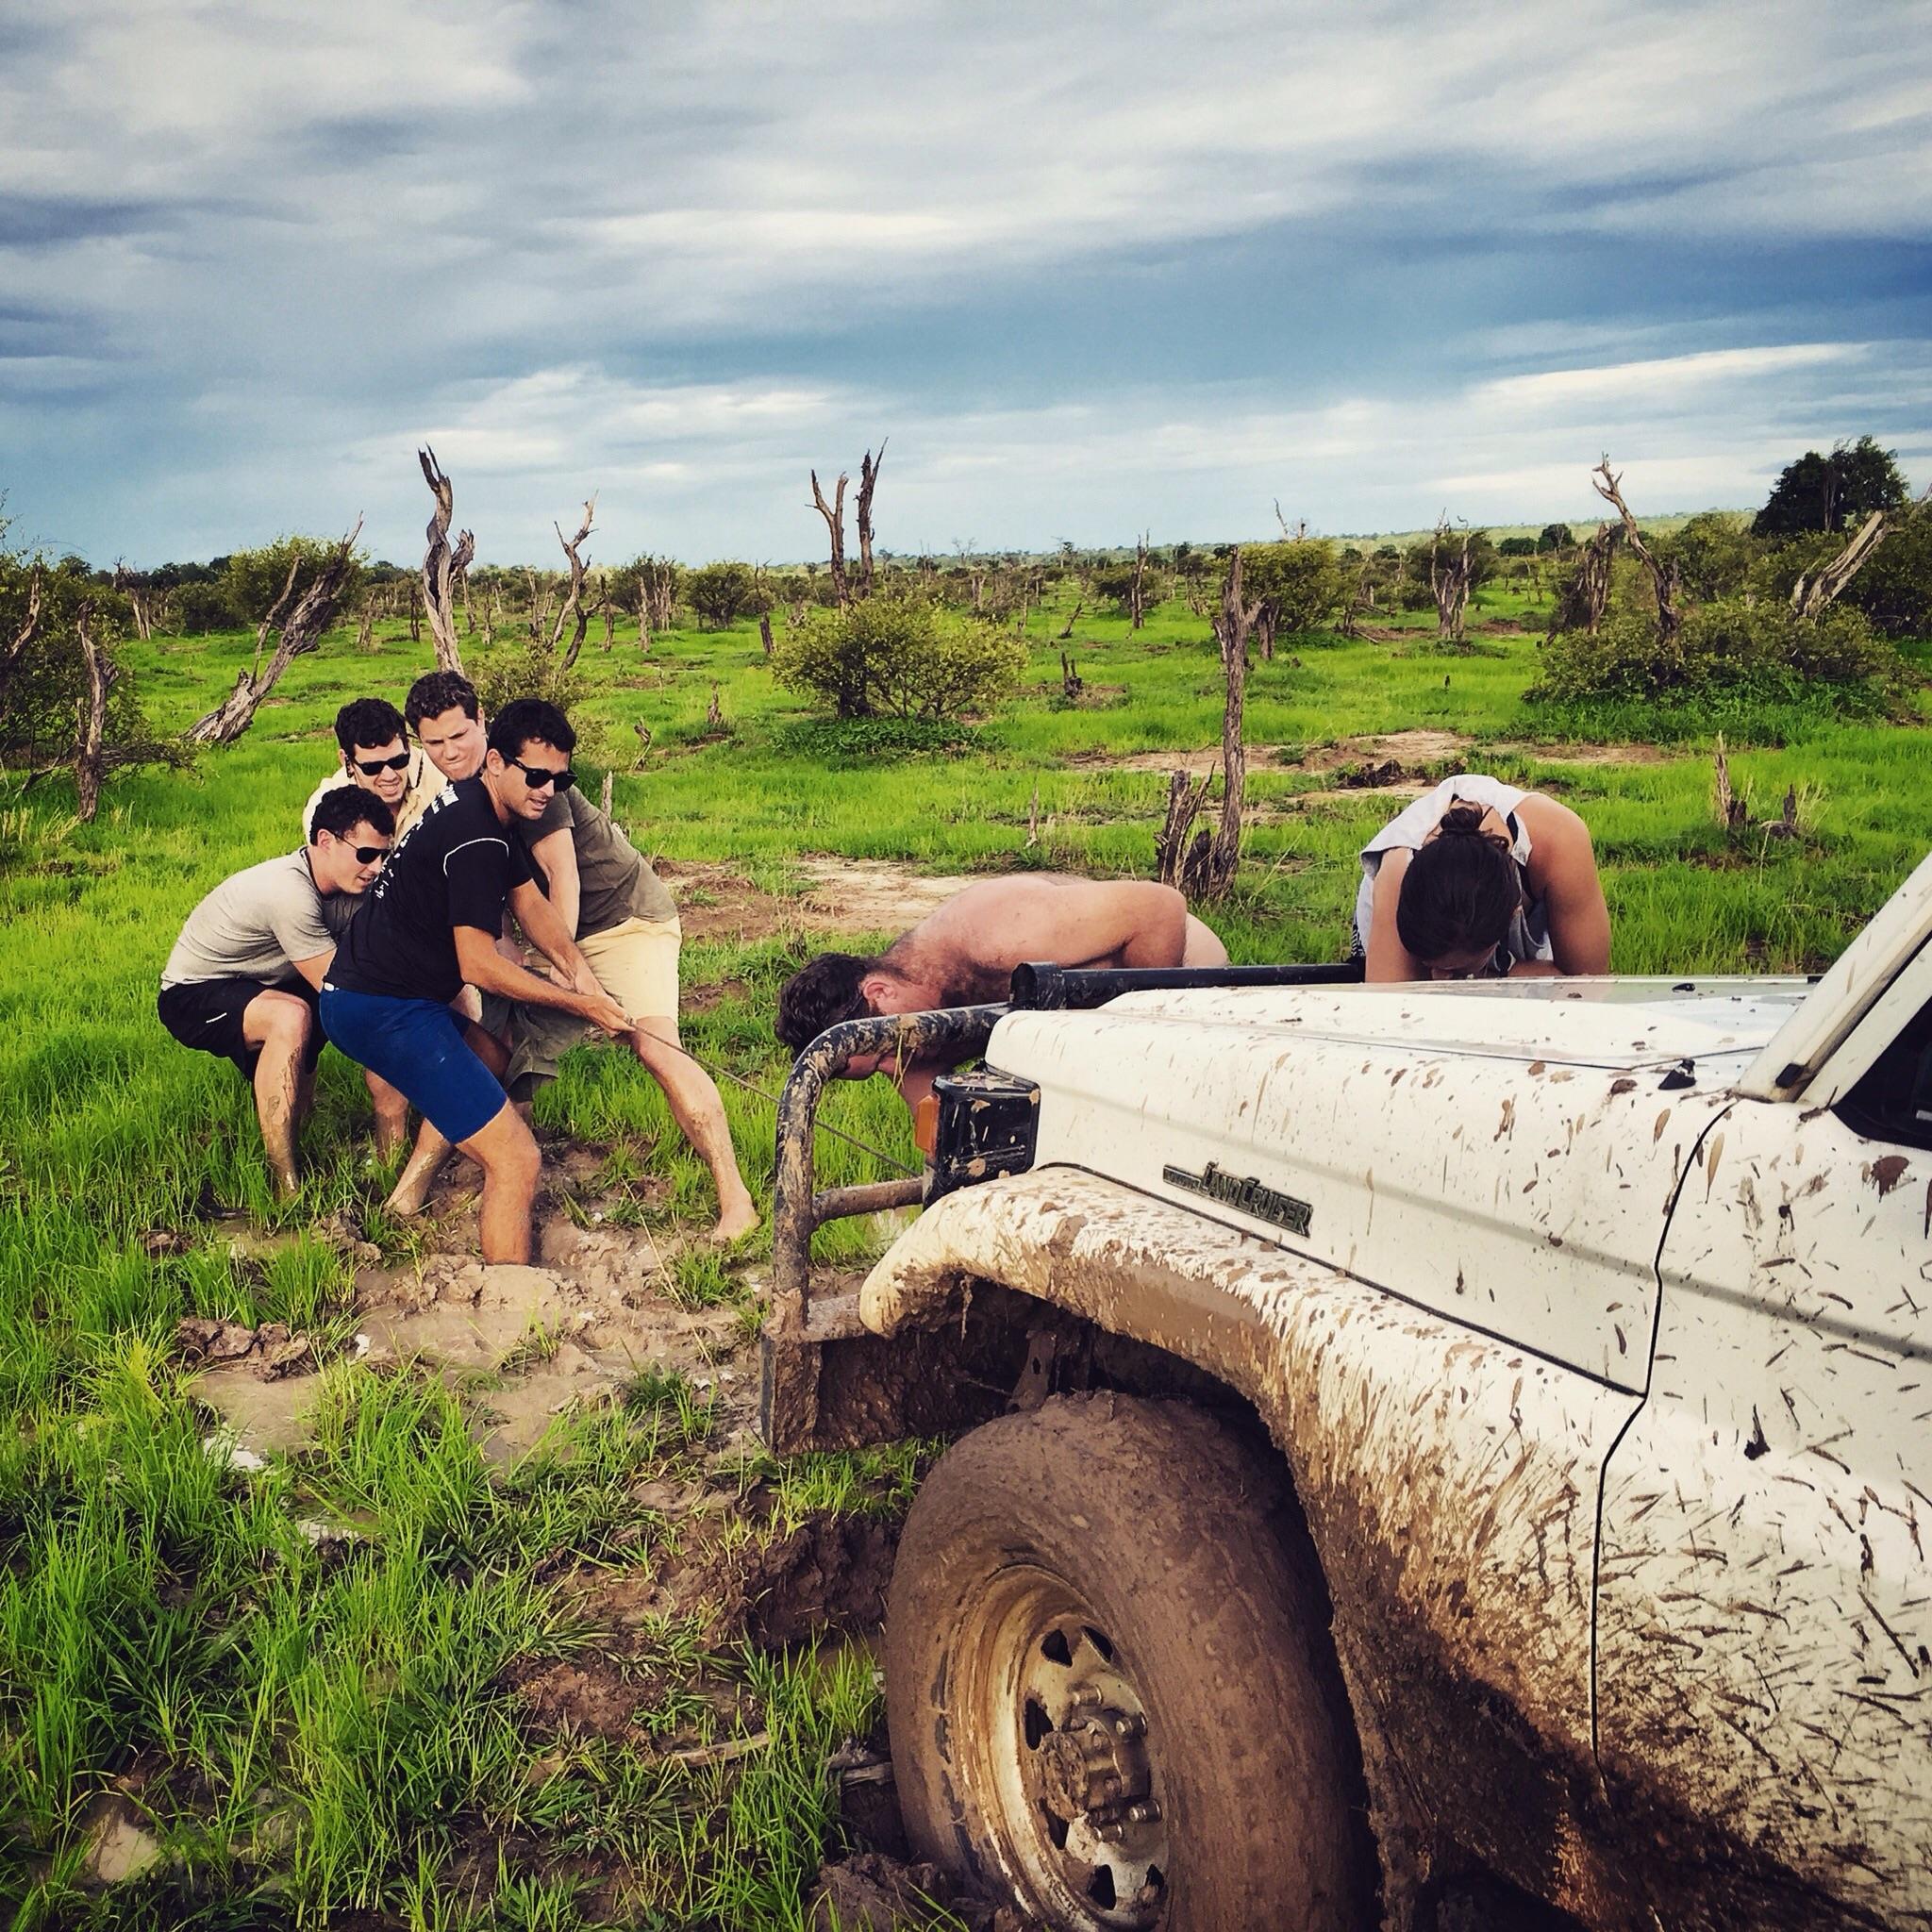 Boy band tour bus gets stuck in mud, bye bye bye tour bus